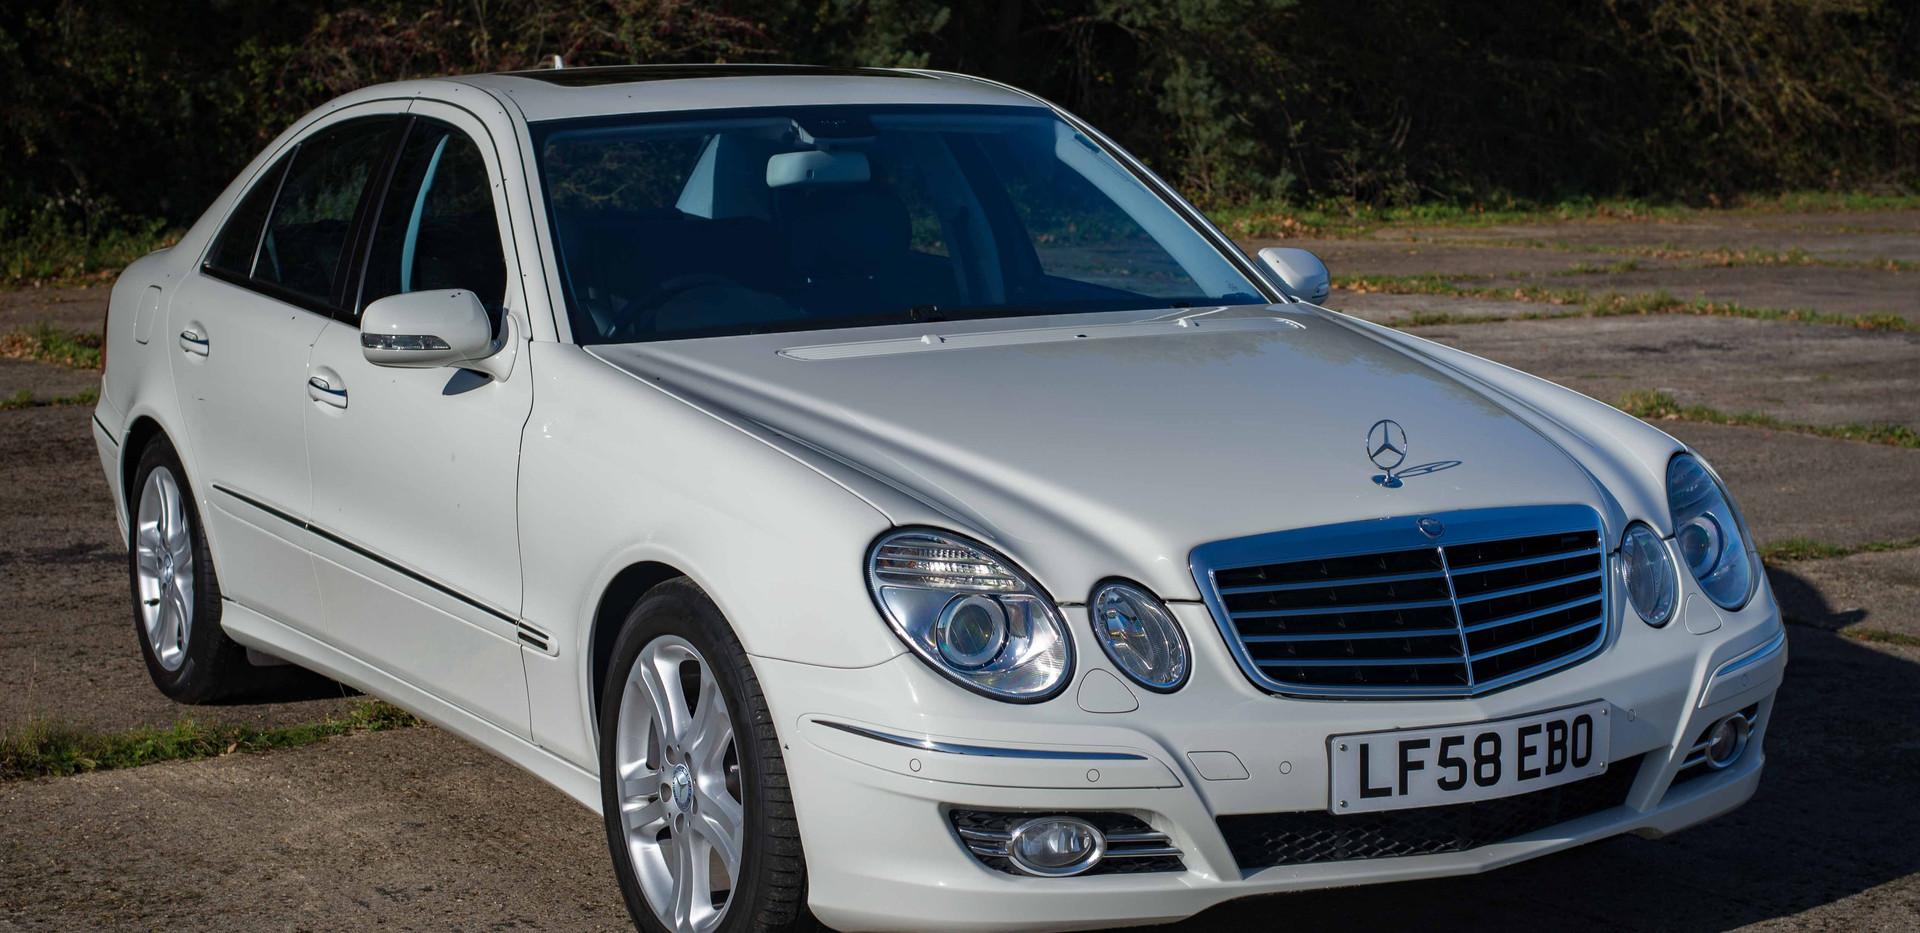 Mercedes E350 For Sale UK London  (27 of